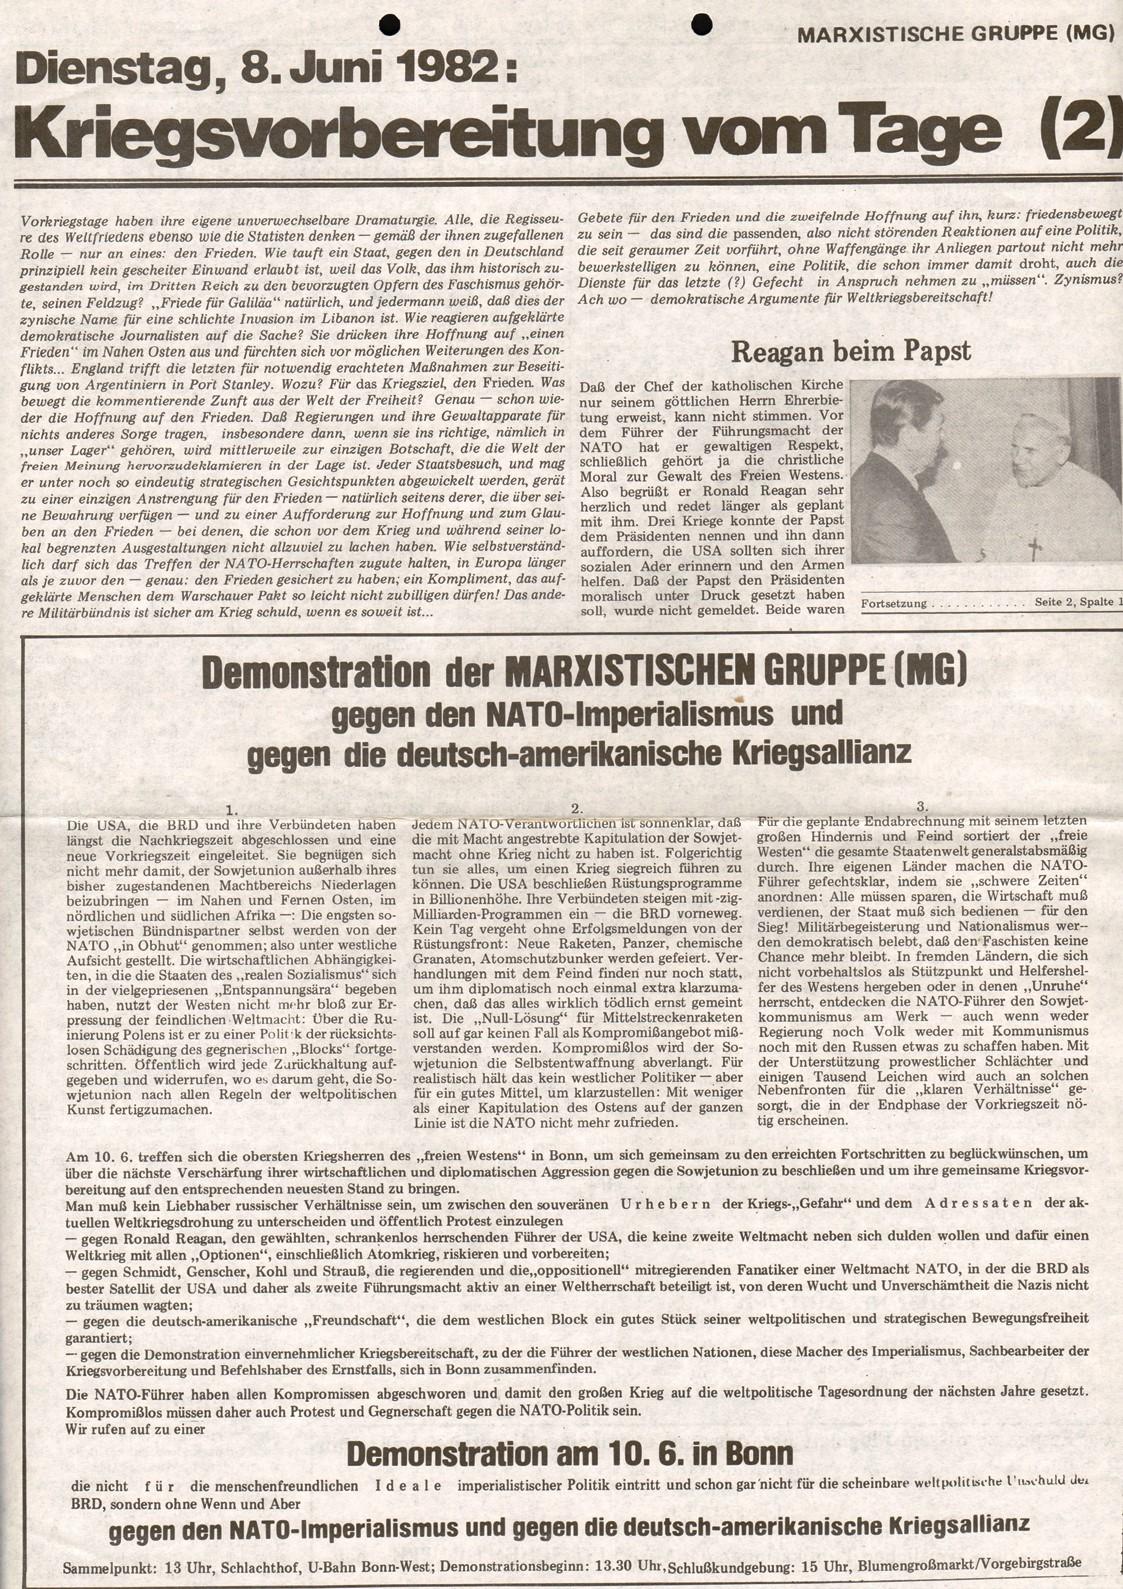 Berlin_MG_FB_19820608_01